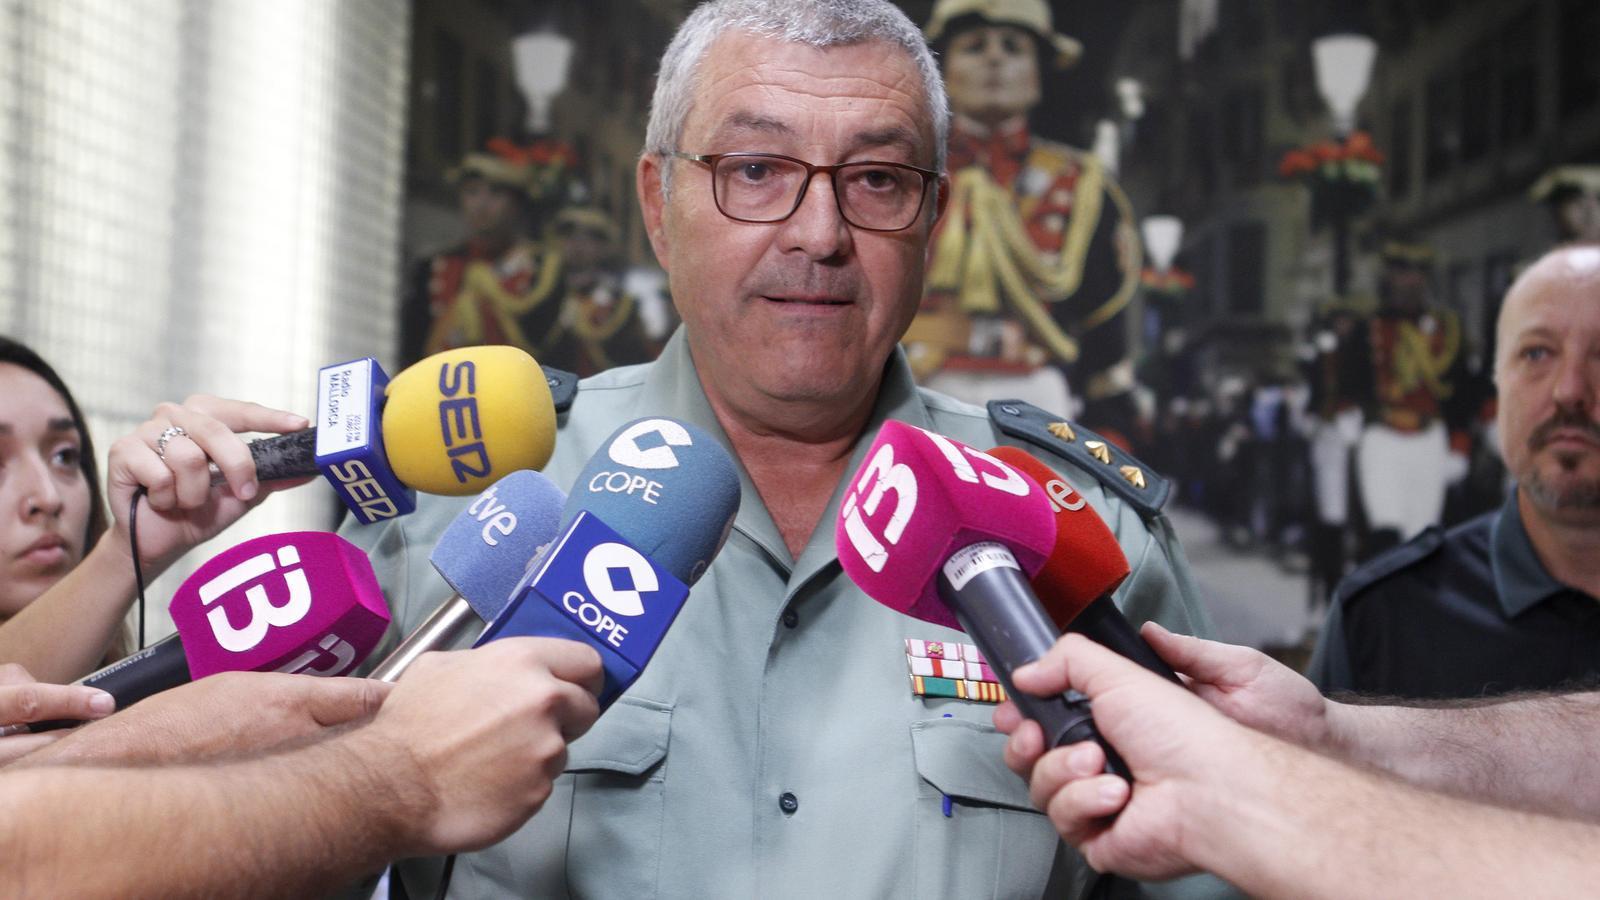 El coronell Barceló en una foto d'arxiu.